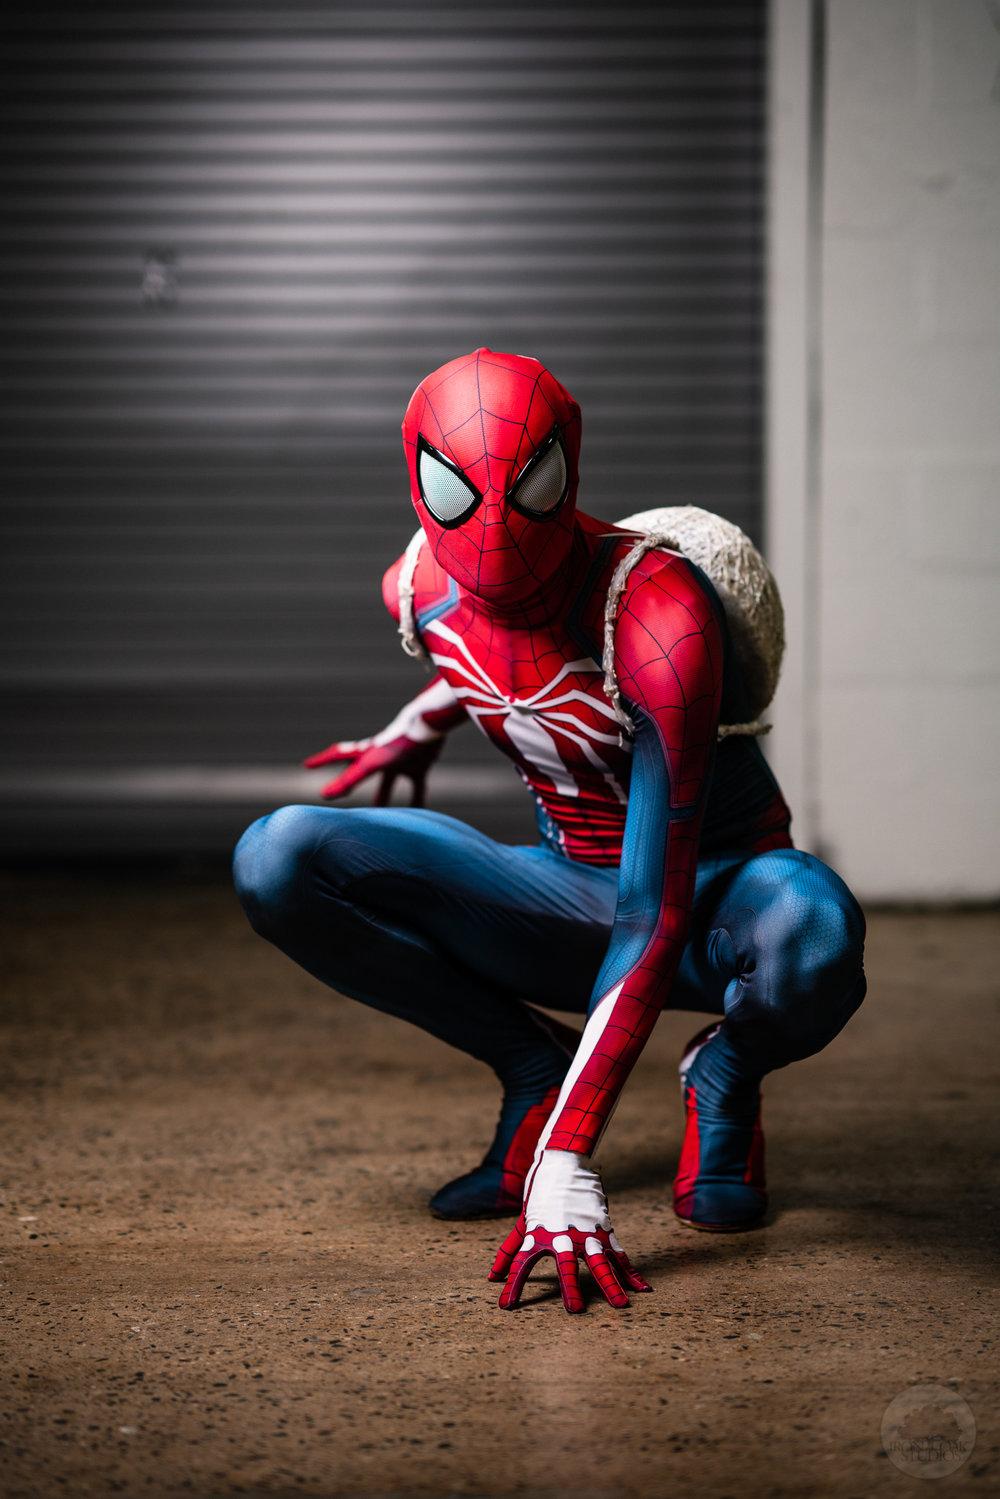 IronOakStudios_Phila_ComicCon_Spider-Man_Cosplay.jpg